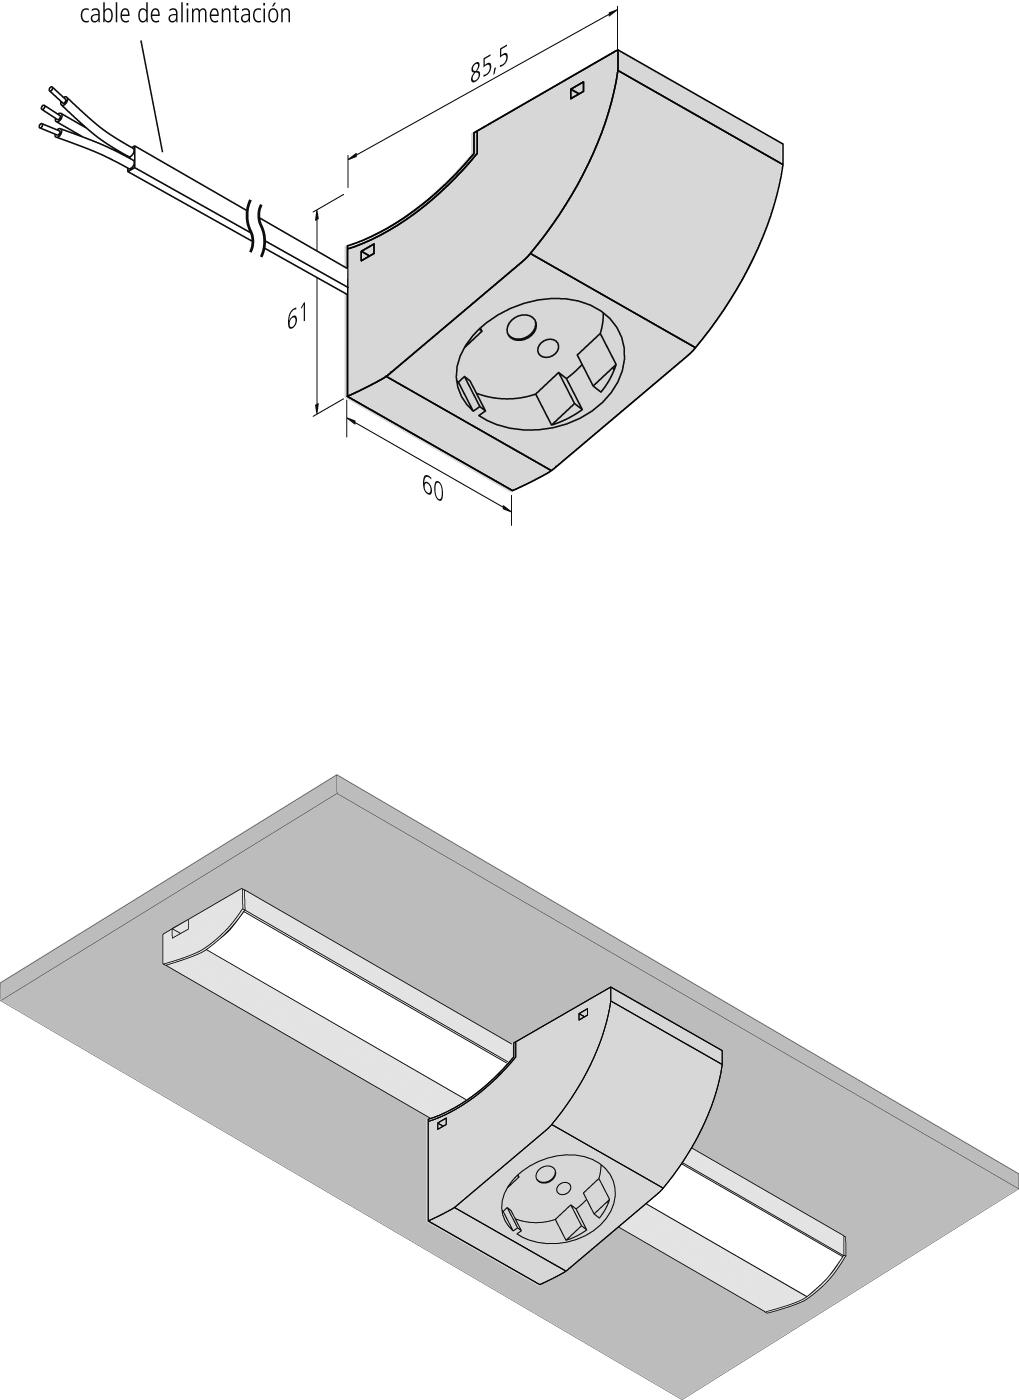 Vista preliminar: Steckdose-LED-ModuLite-F_es